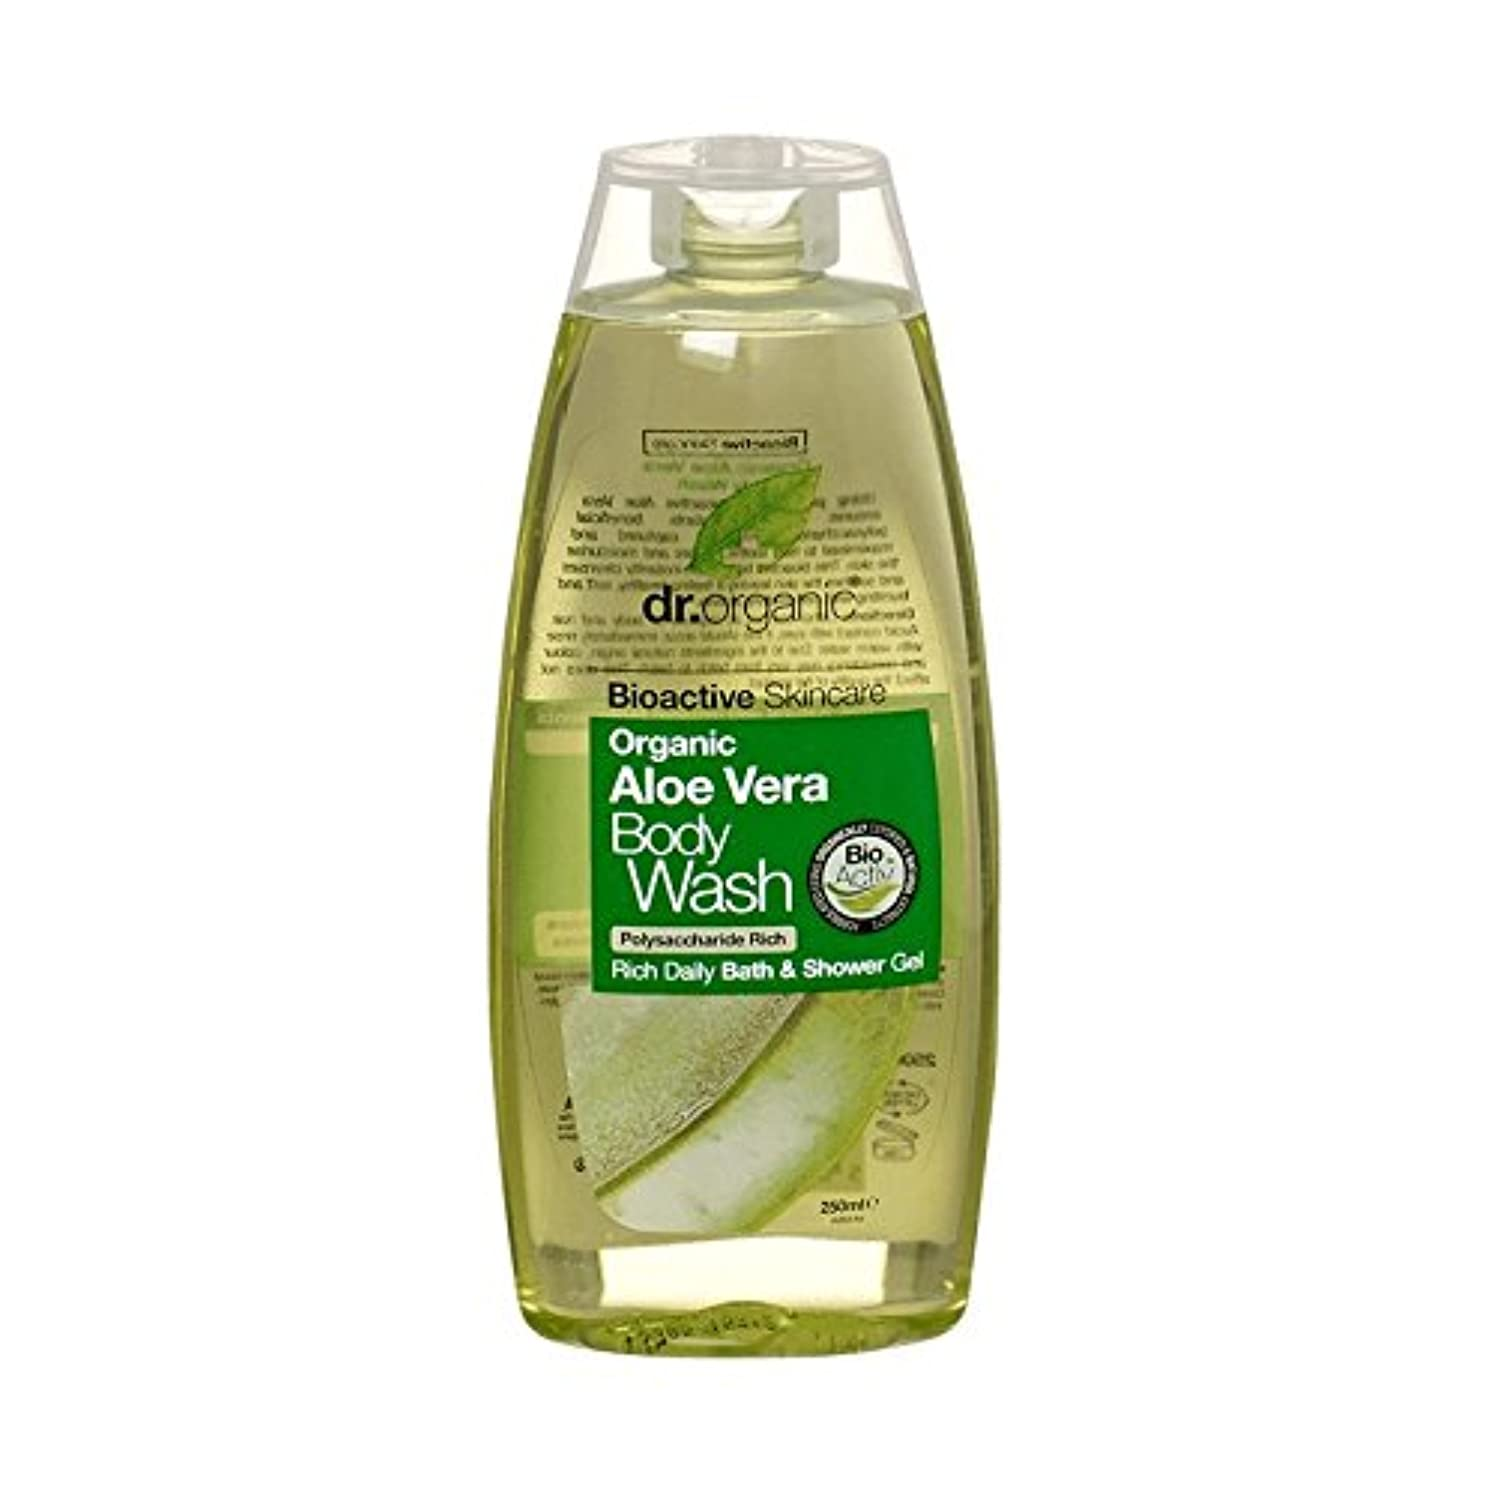 Dr有機アロエベラボディウォッシュ - Dr Organic Aloe Vera Body Wash (Dr Organic) [並行輸入品]